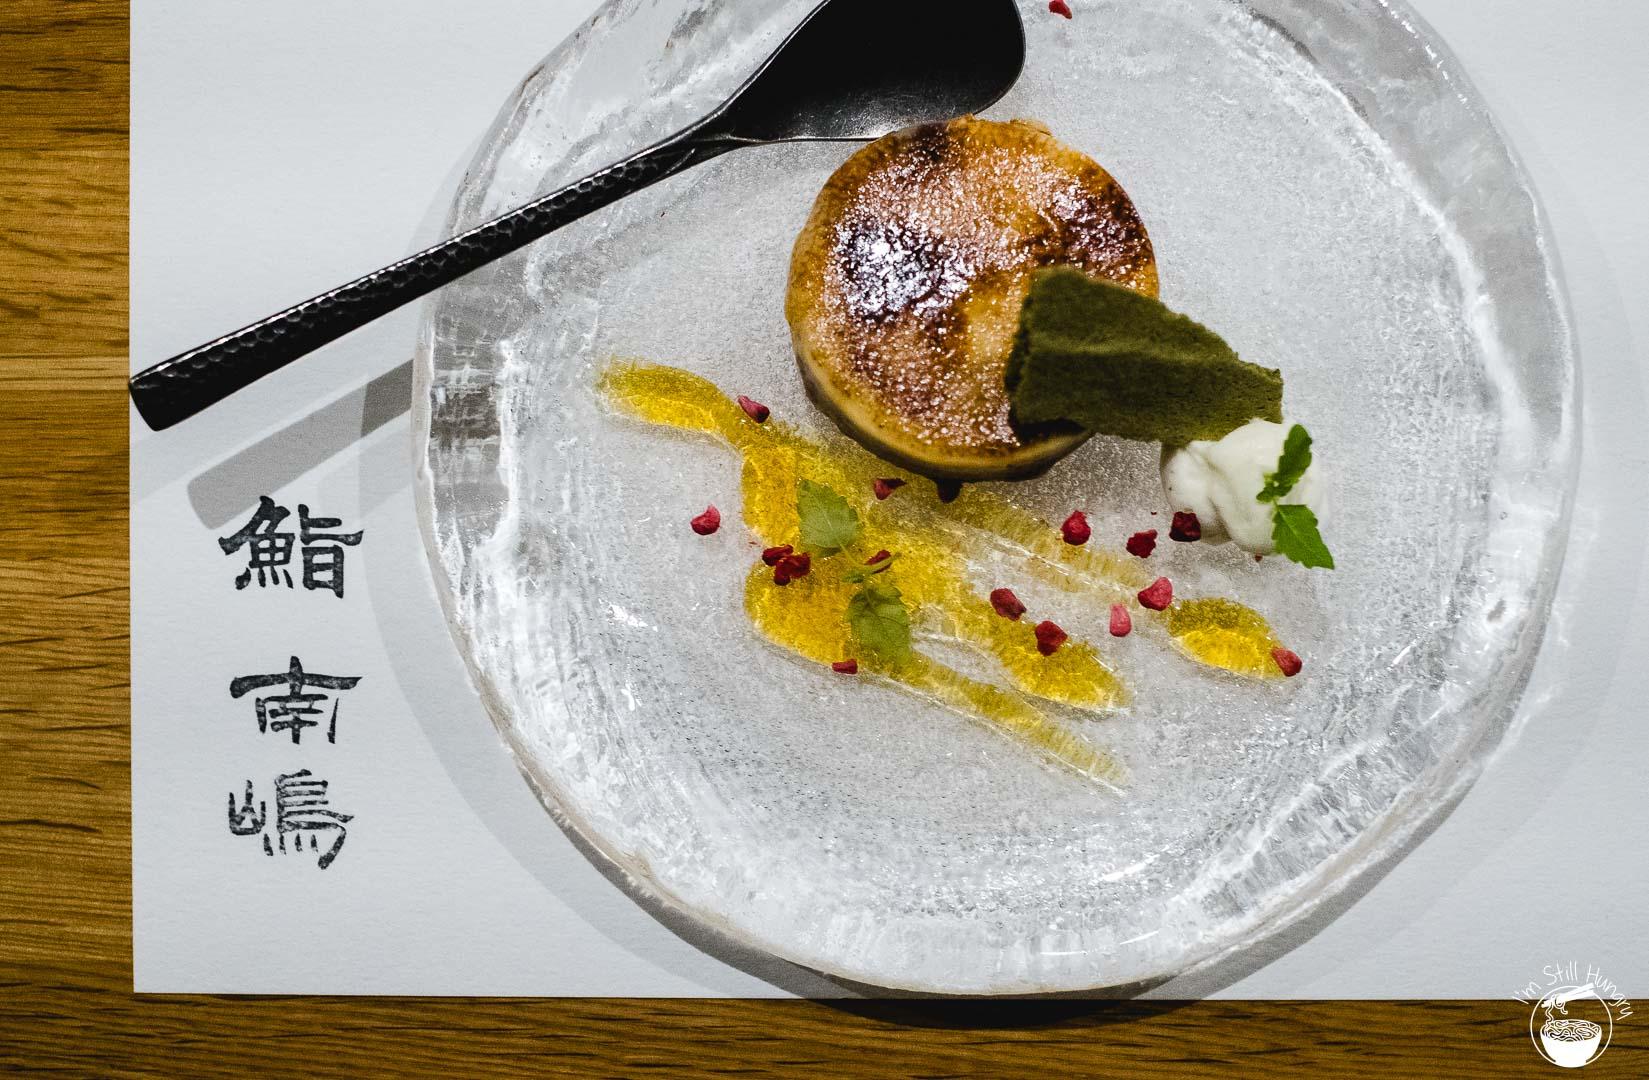 Minamishima Melbourne Azuki brulee, matcha meringue, dried raspberry, caramel